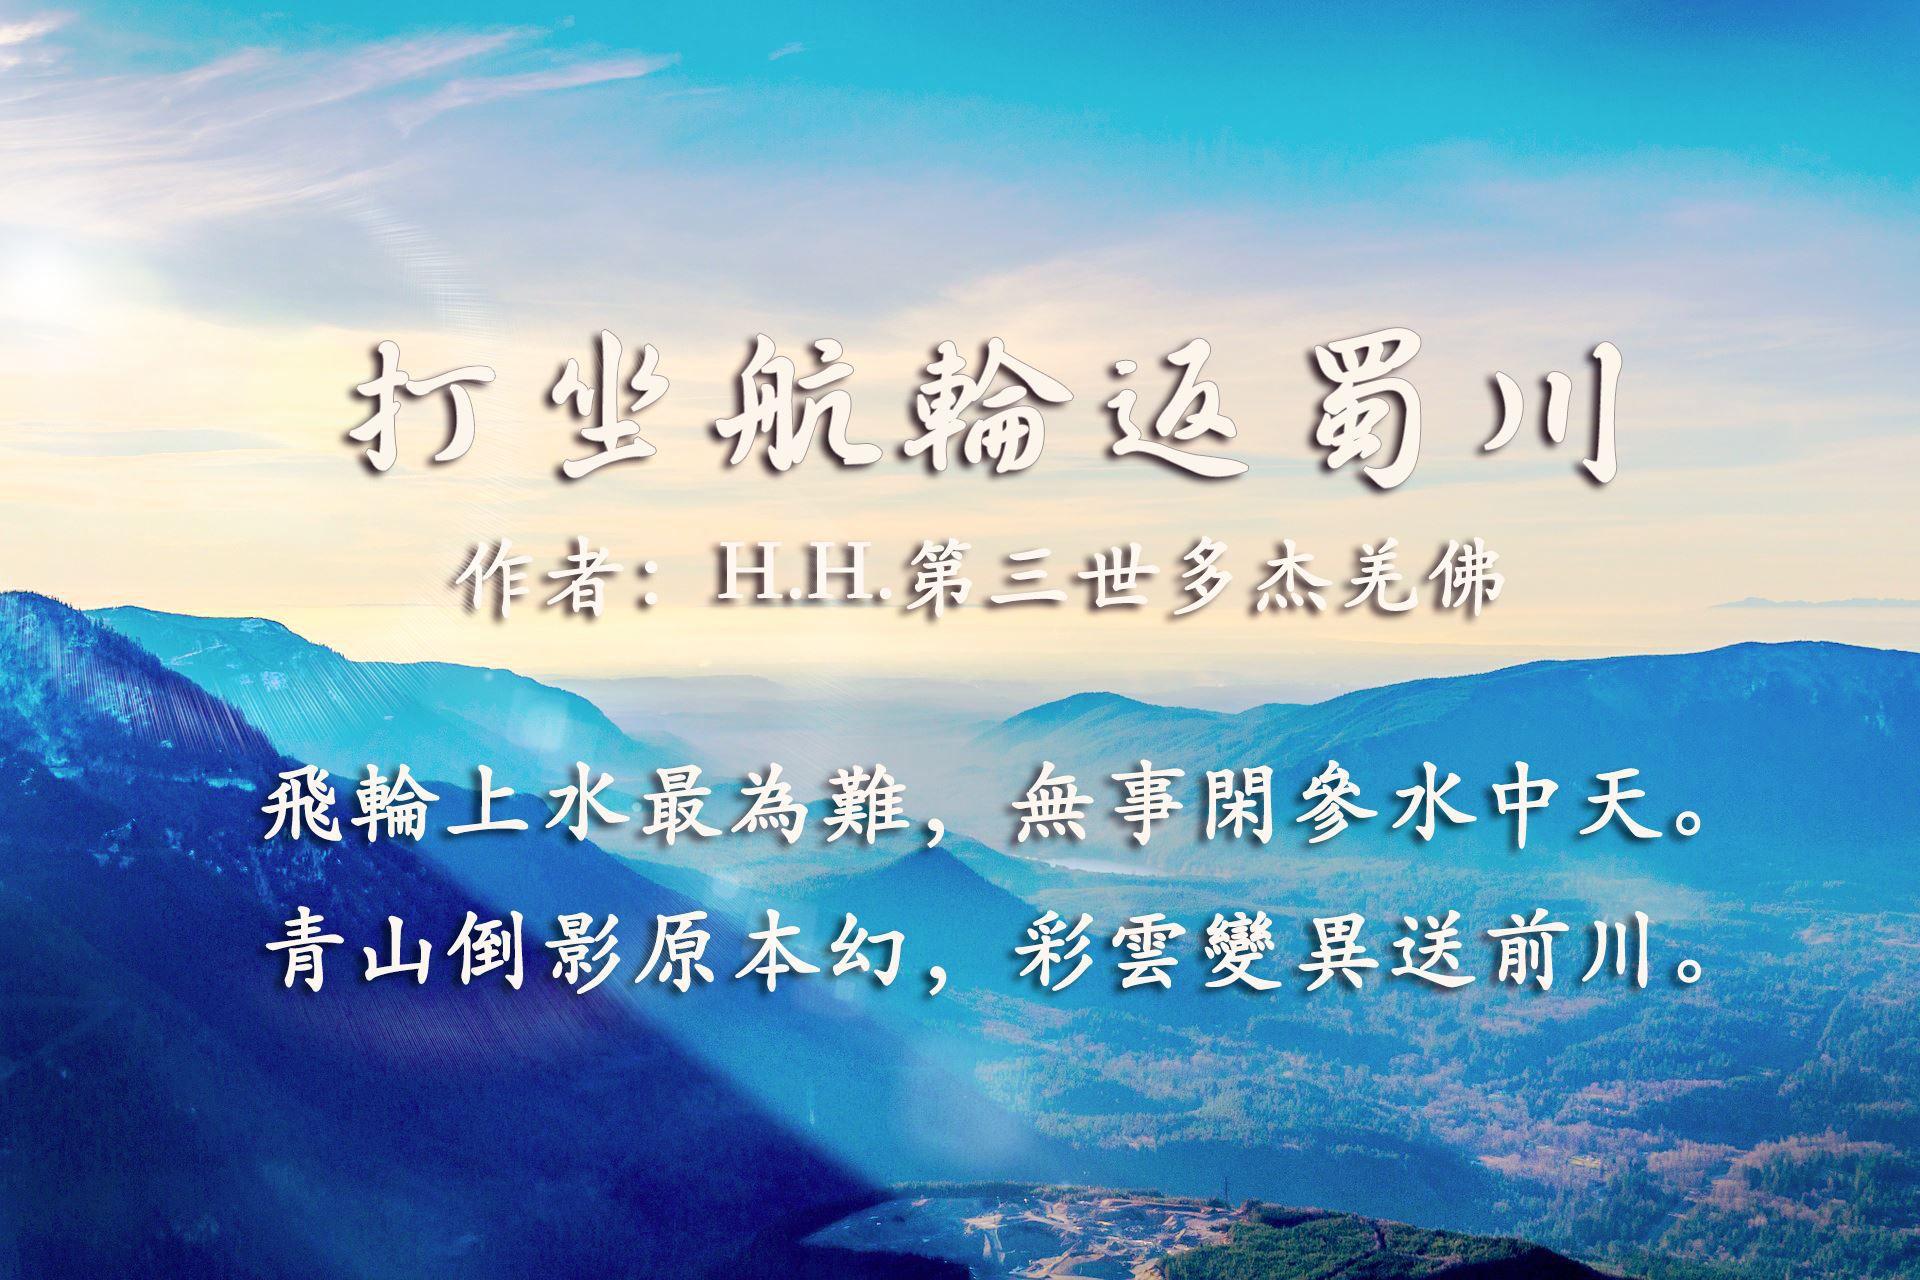 H.H.第三世多杰羌佛詩詞歌賦作品:打坐航輪返蜀川